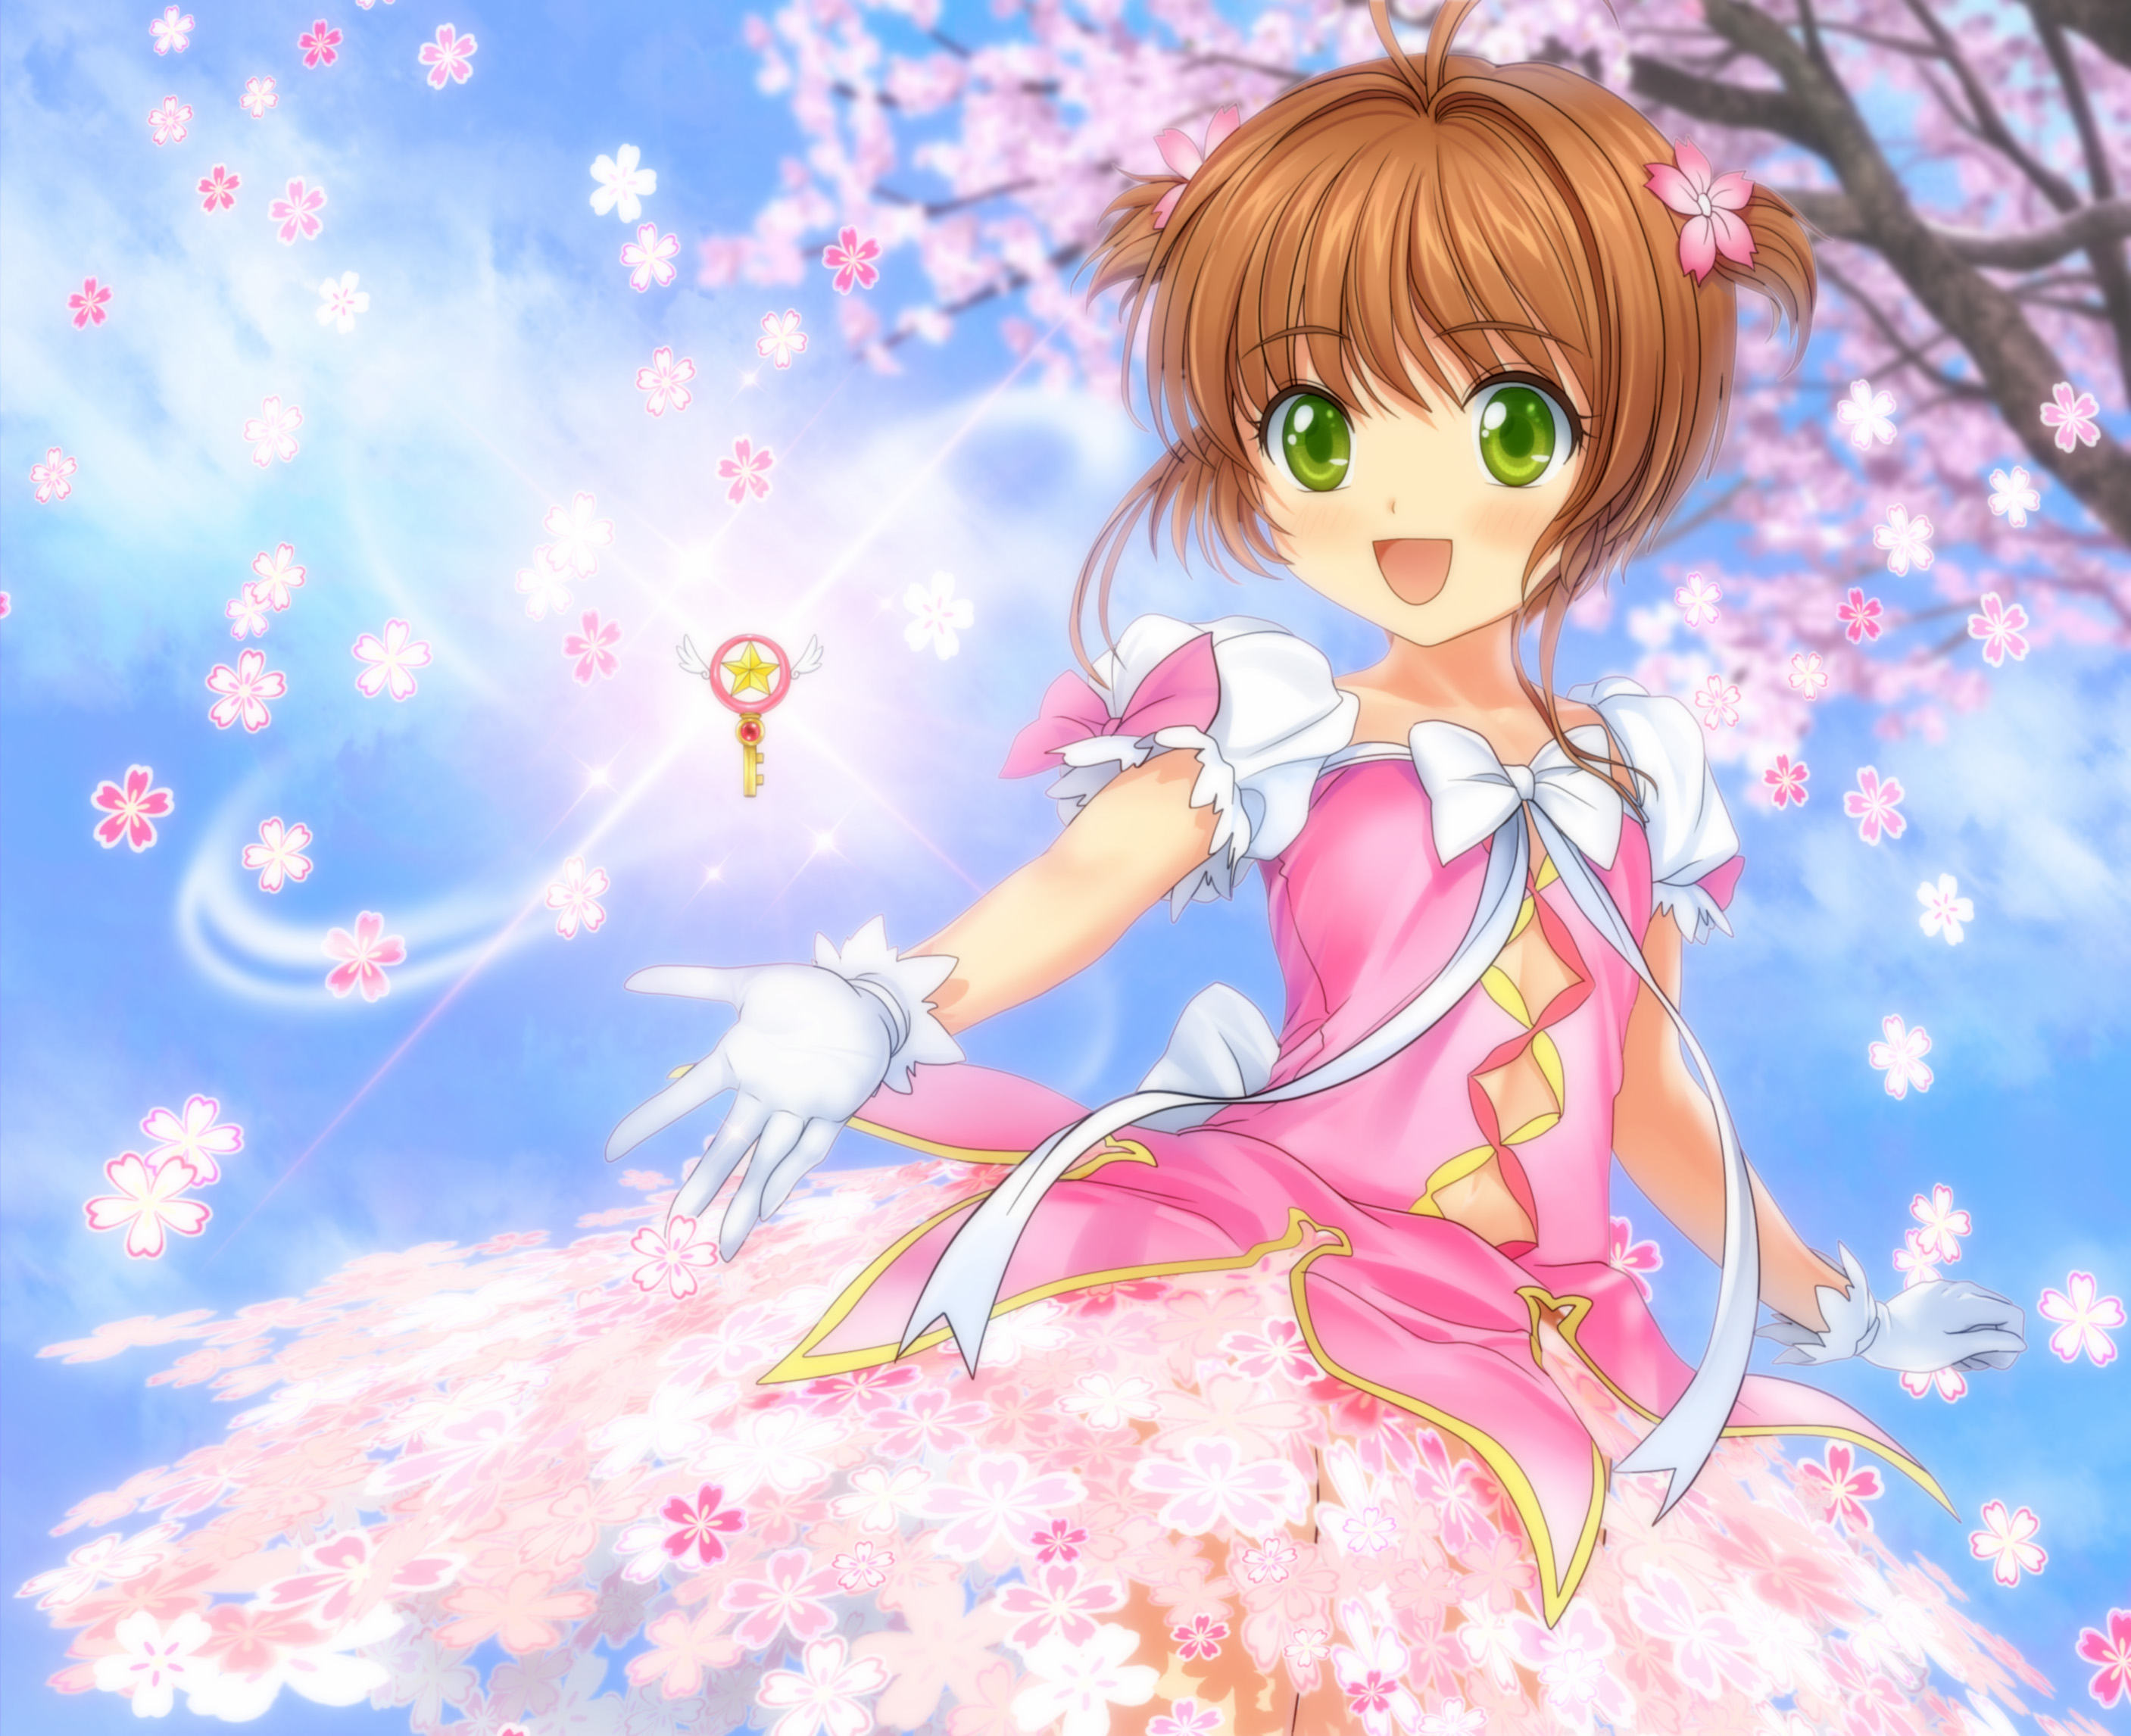 card captor sakura cherry blossoms dress gloves green eyes kinomoto